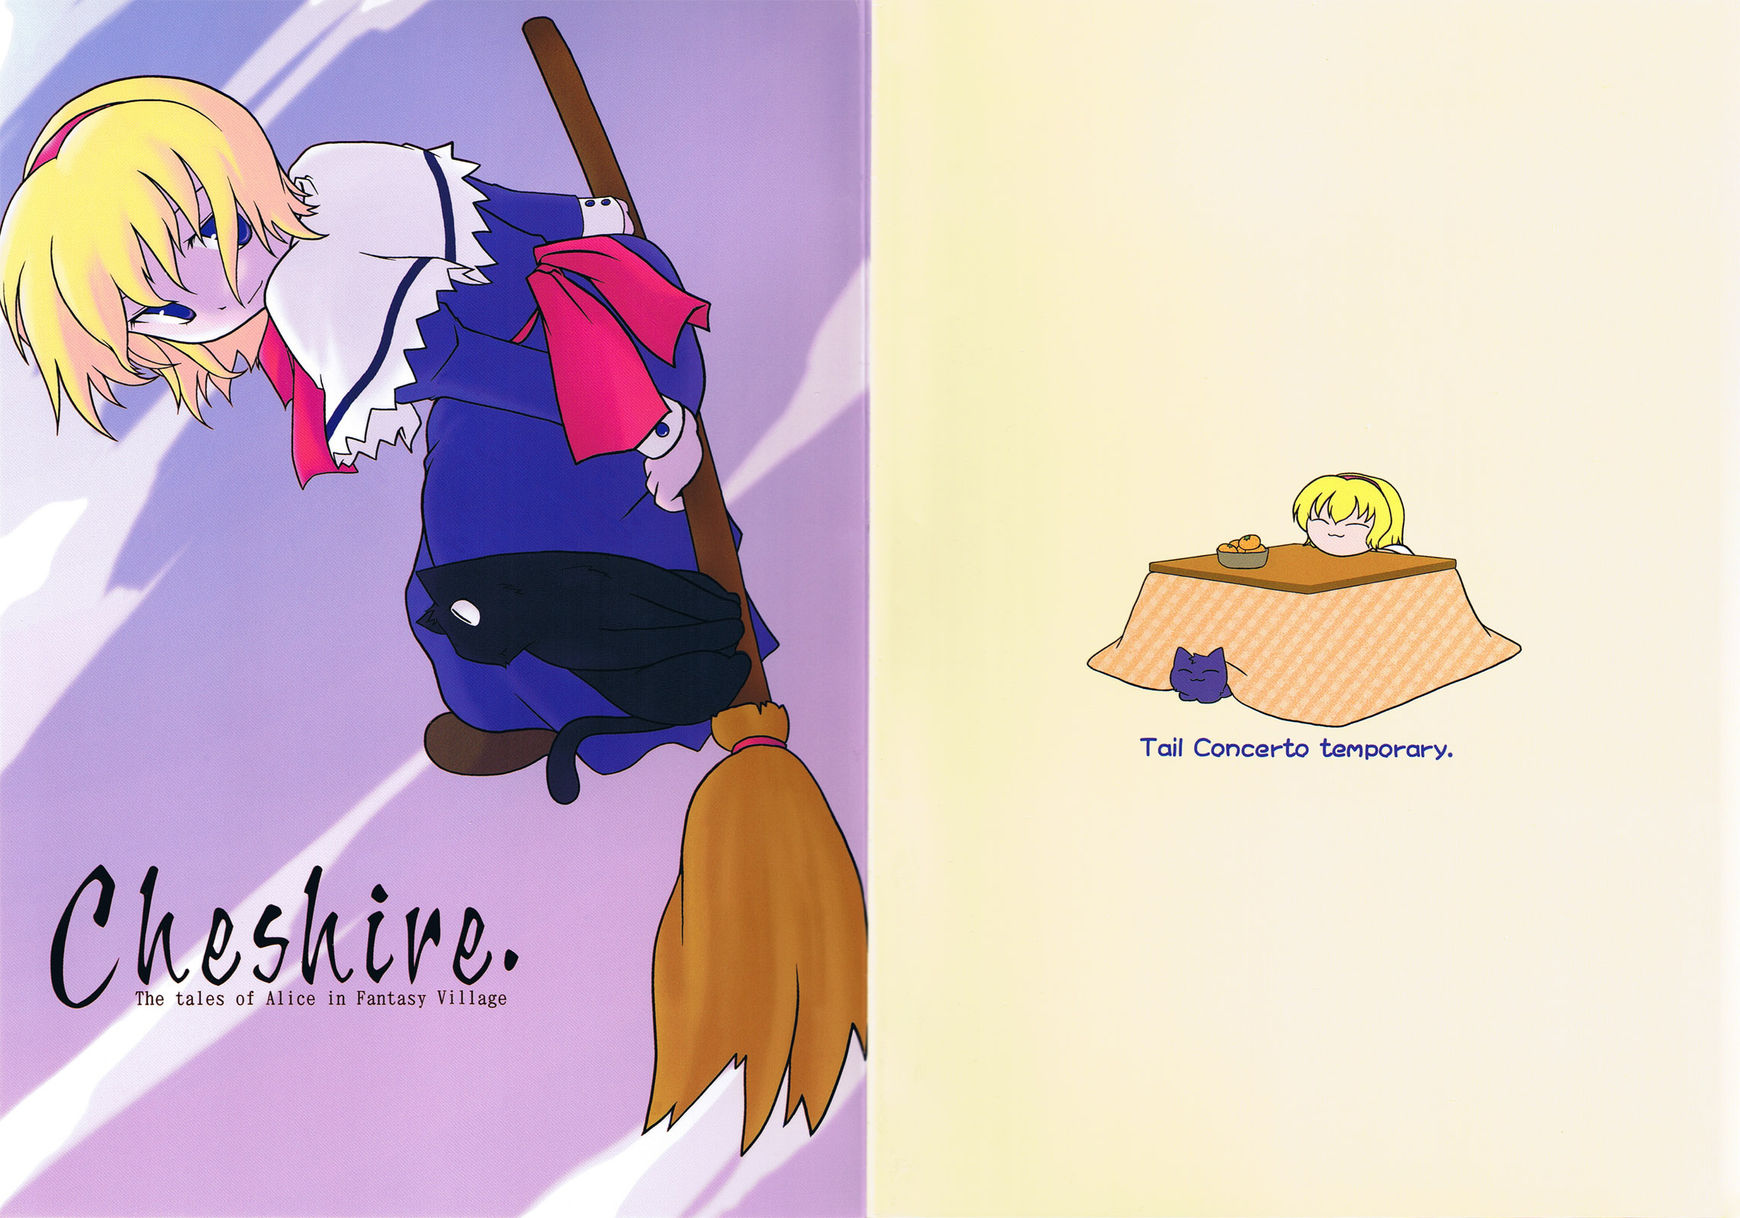 Touhou dj - Cheshire 1 Page 1